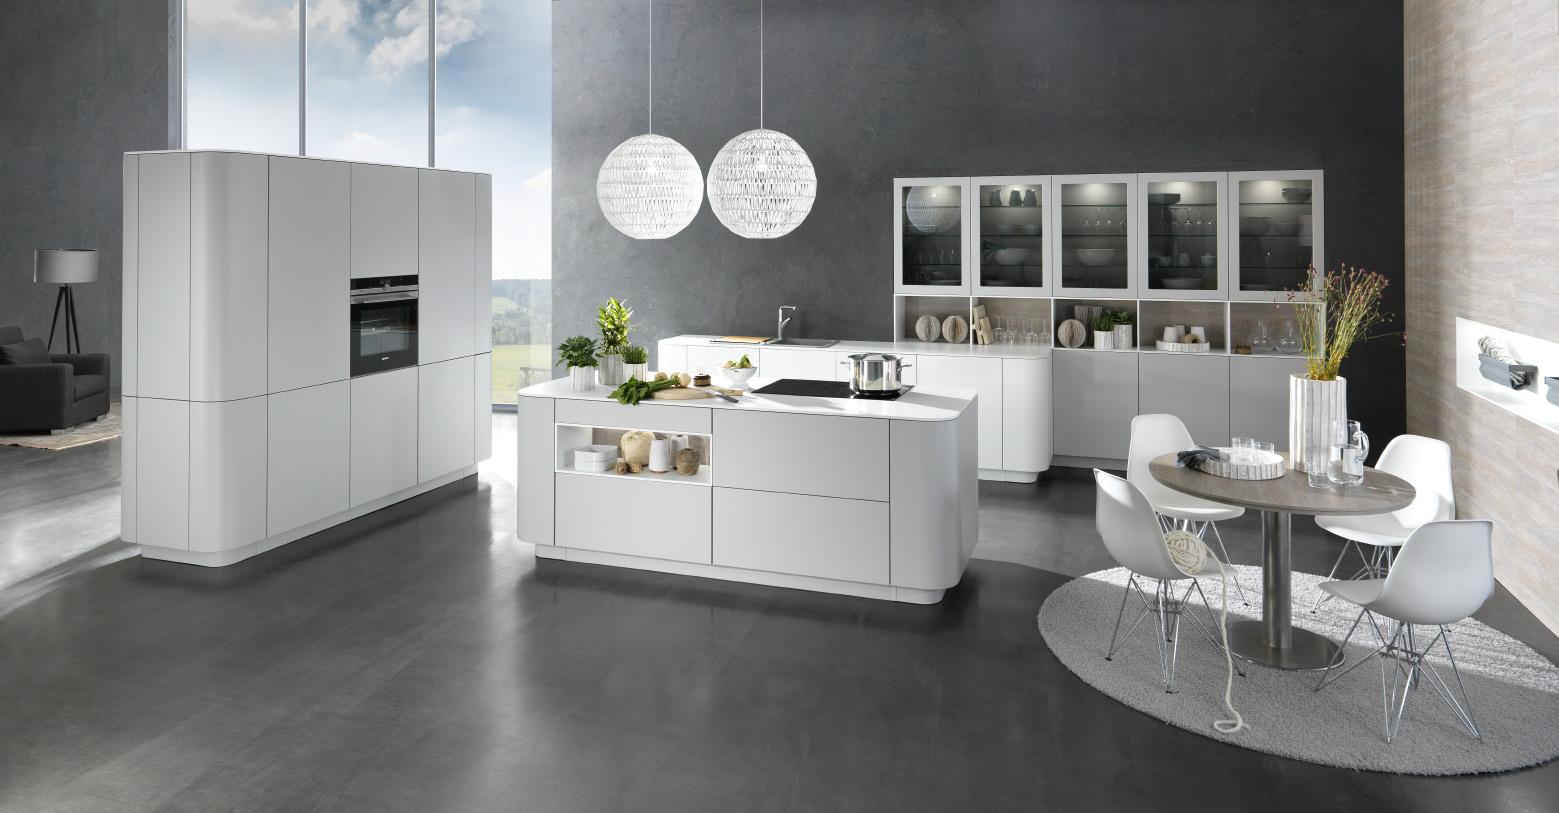 m bel morschett k chen. Black Bedroom Furniture Sets. Home Design Ideas